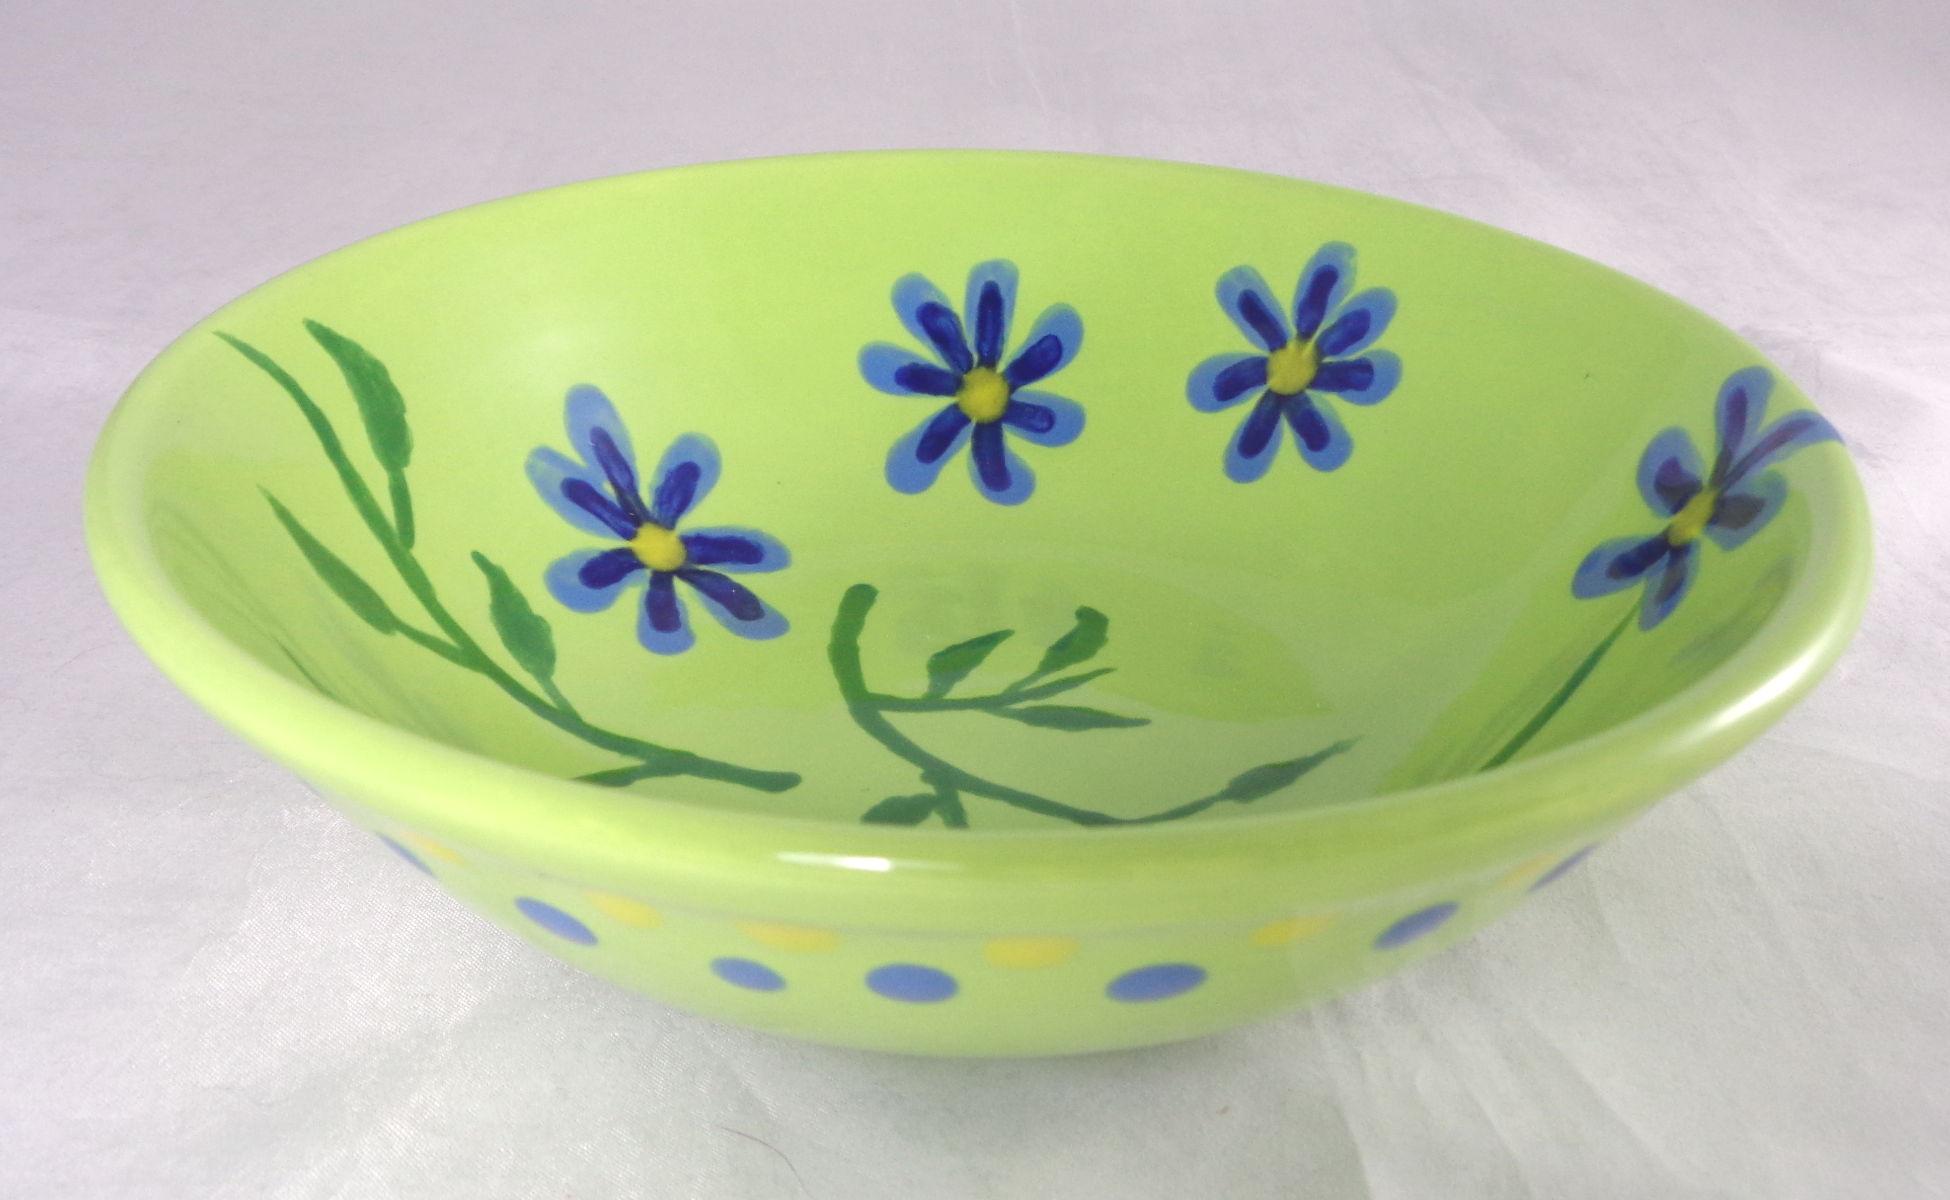 Bemalte Keramik Oslo Schale grün floral